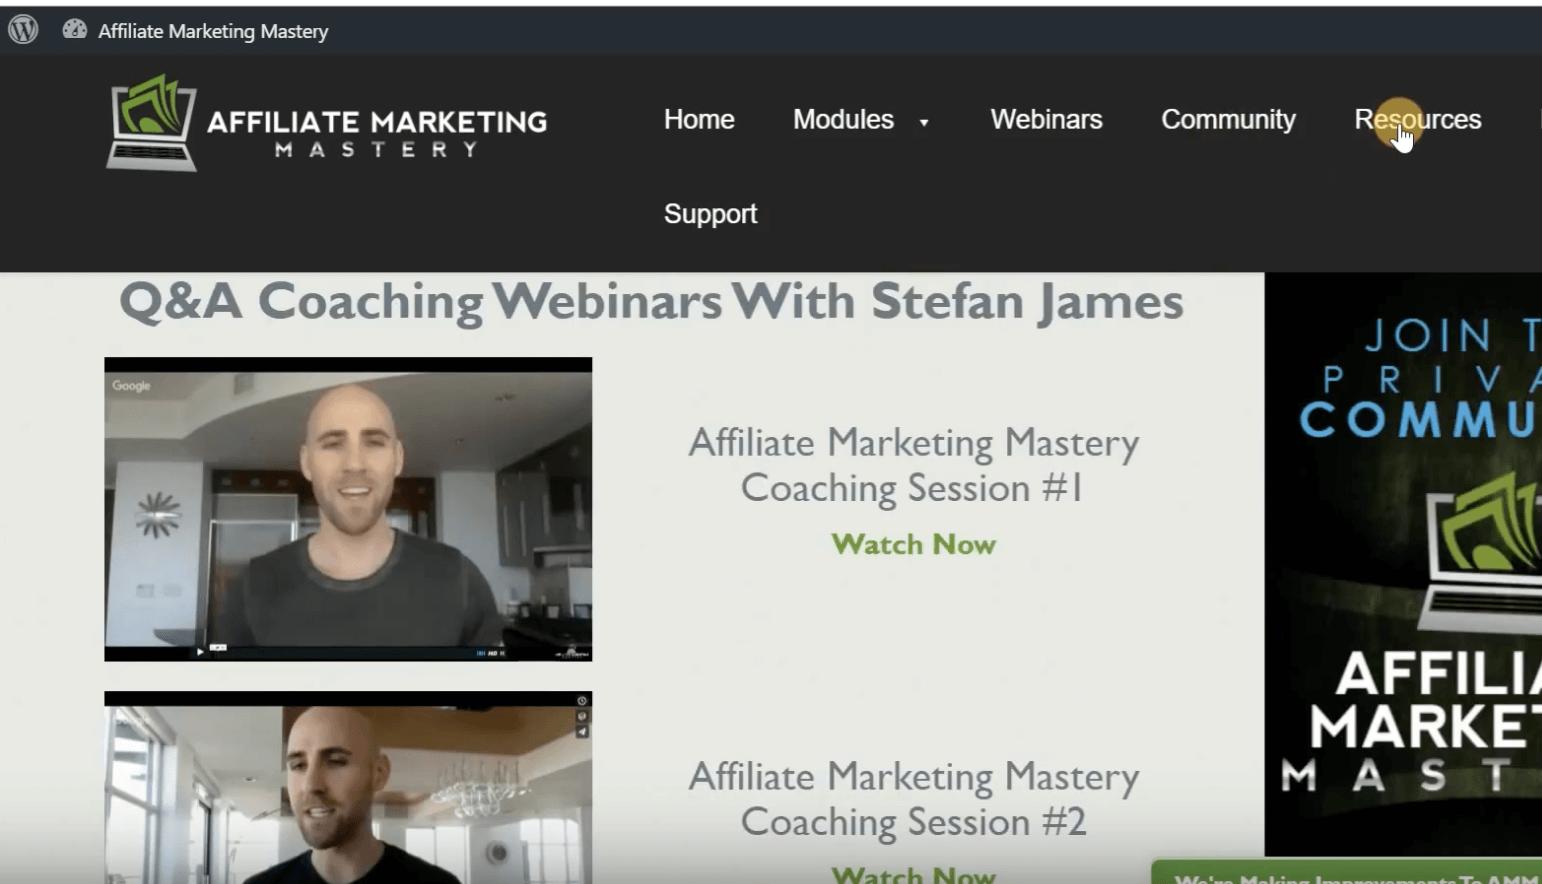 affiliate-marketing-mastery-webinars